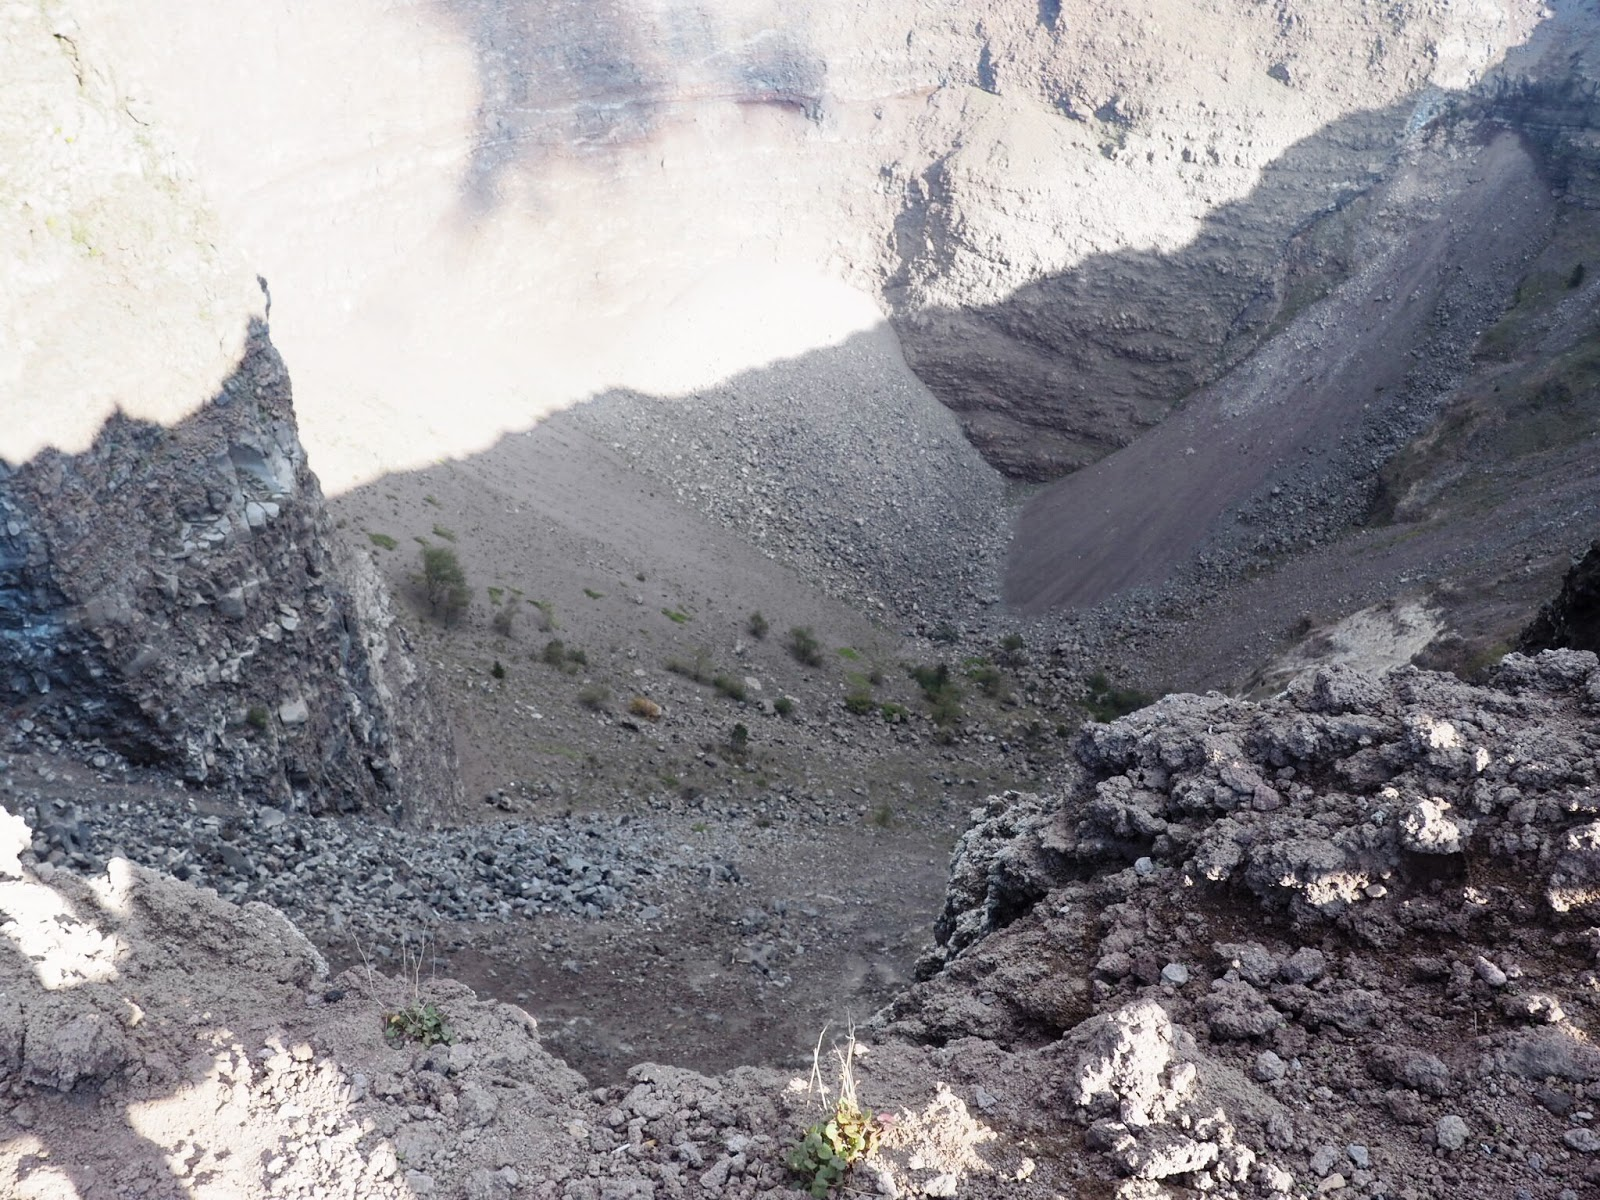 Travel Diary of Naples: Climbing Mt. Vesuvius Volcano | Robyn Bates